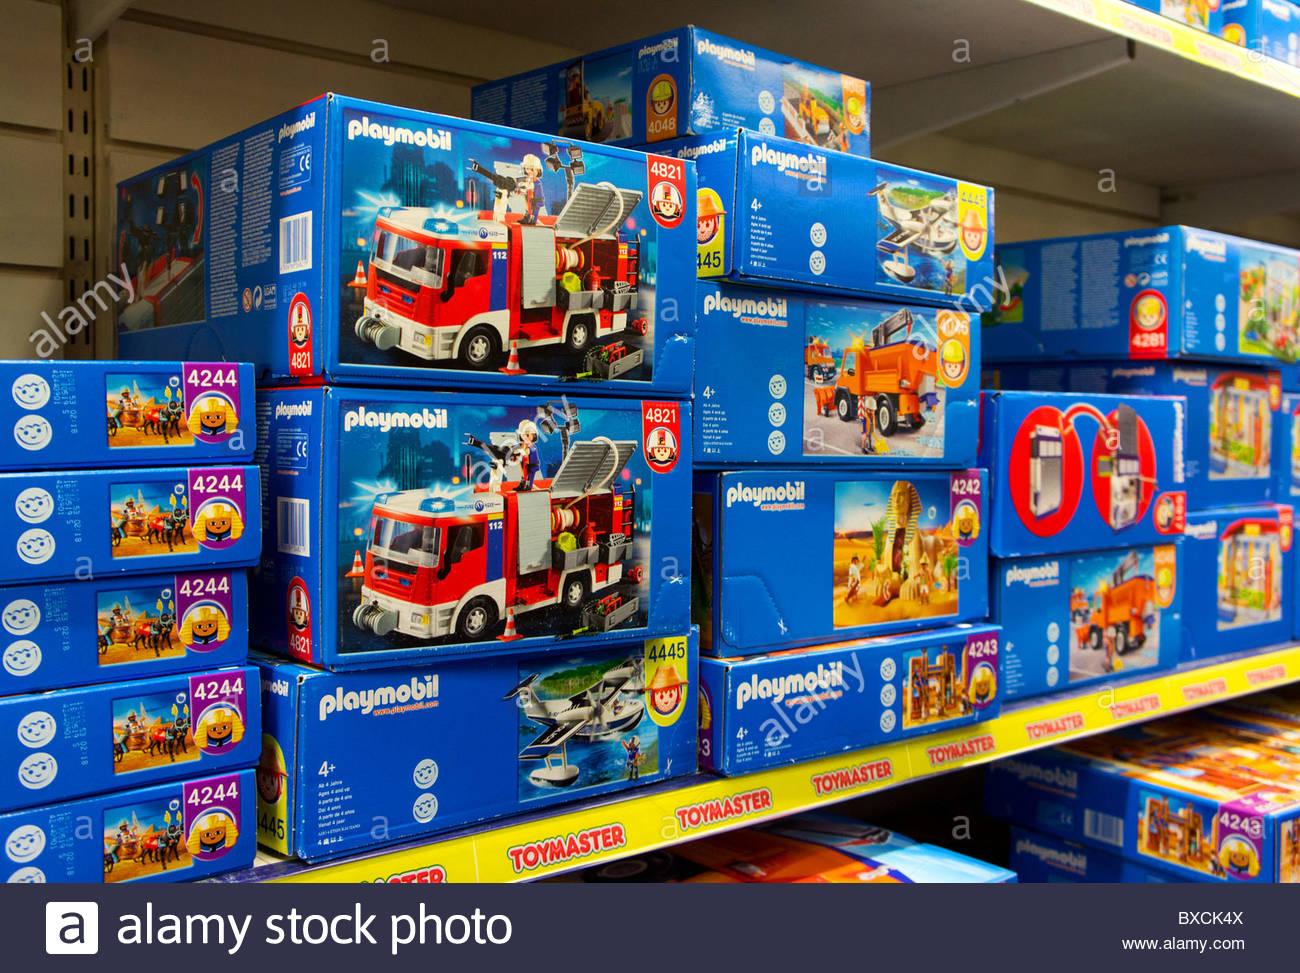 playmobil stock